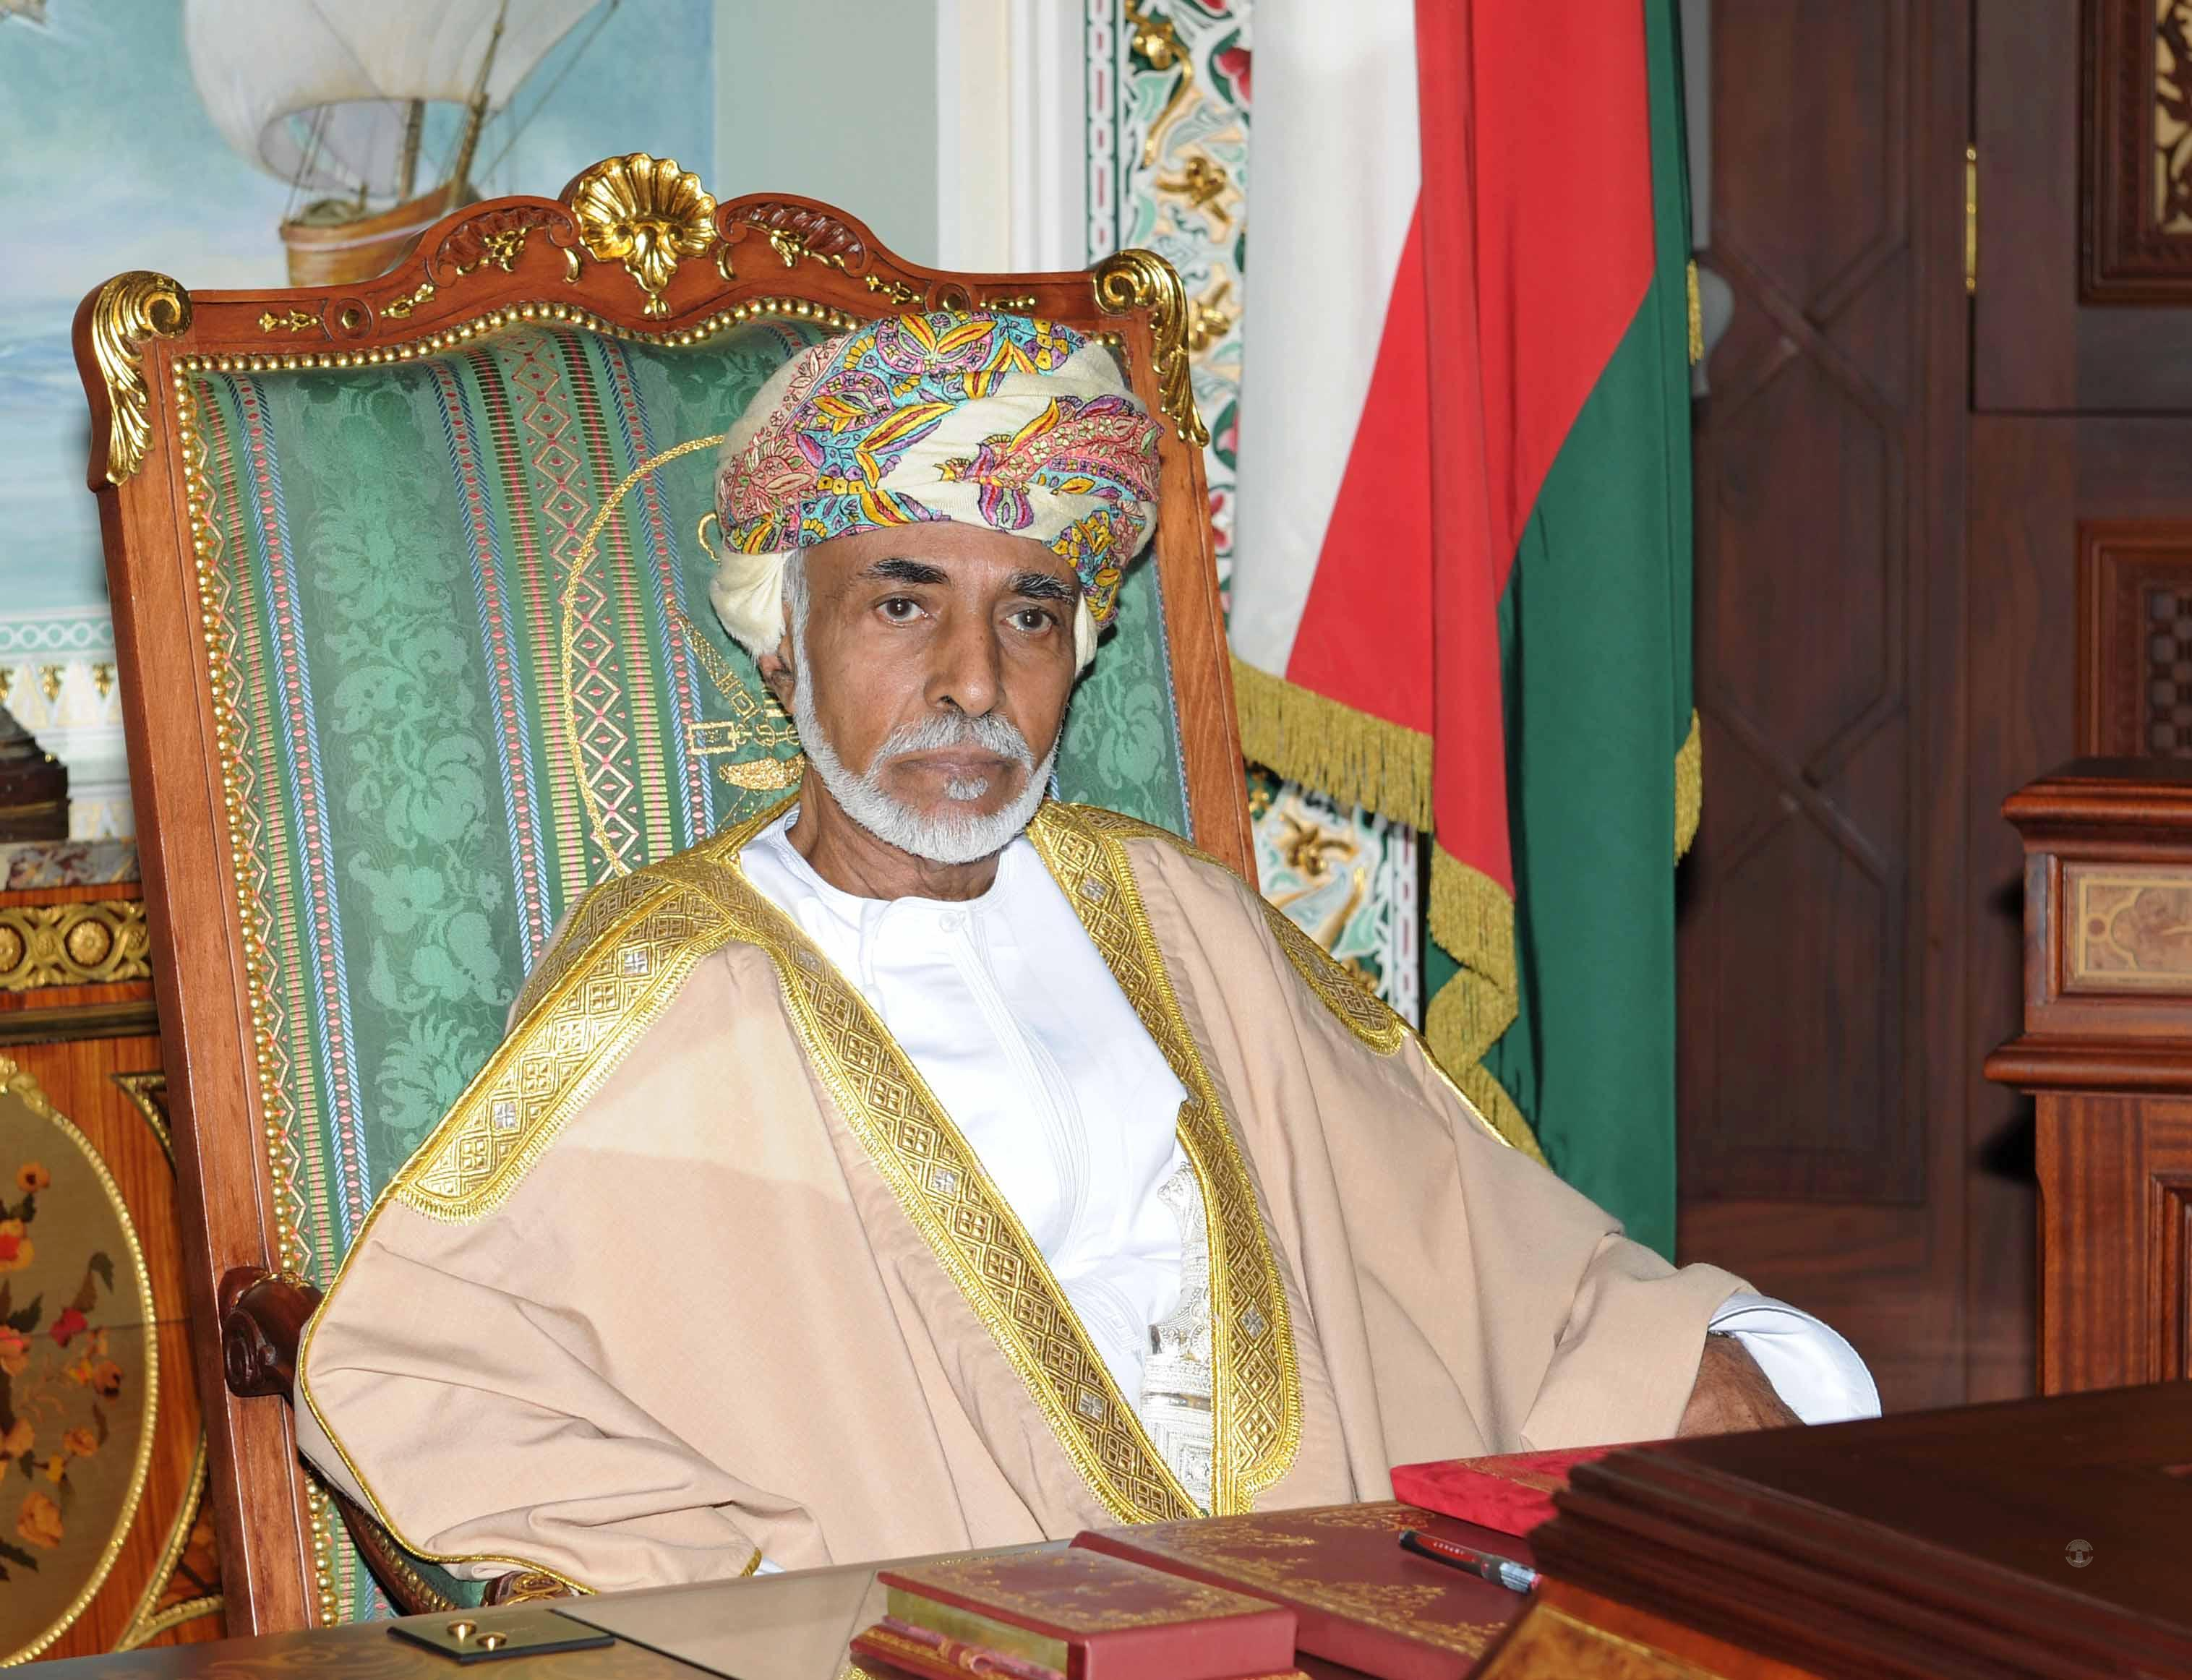 His Majesty sends greetings to Sri Lanka